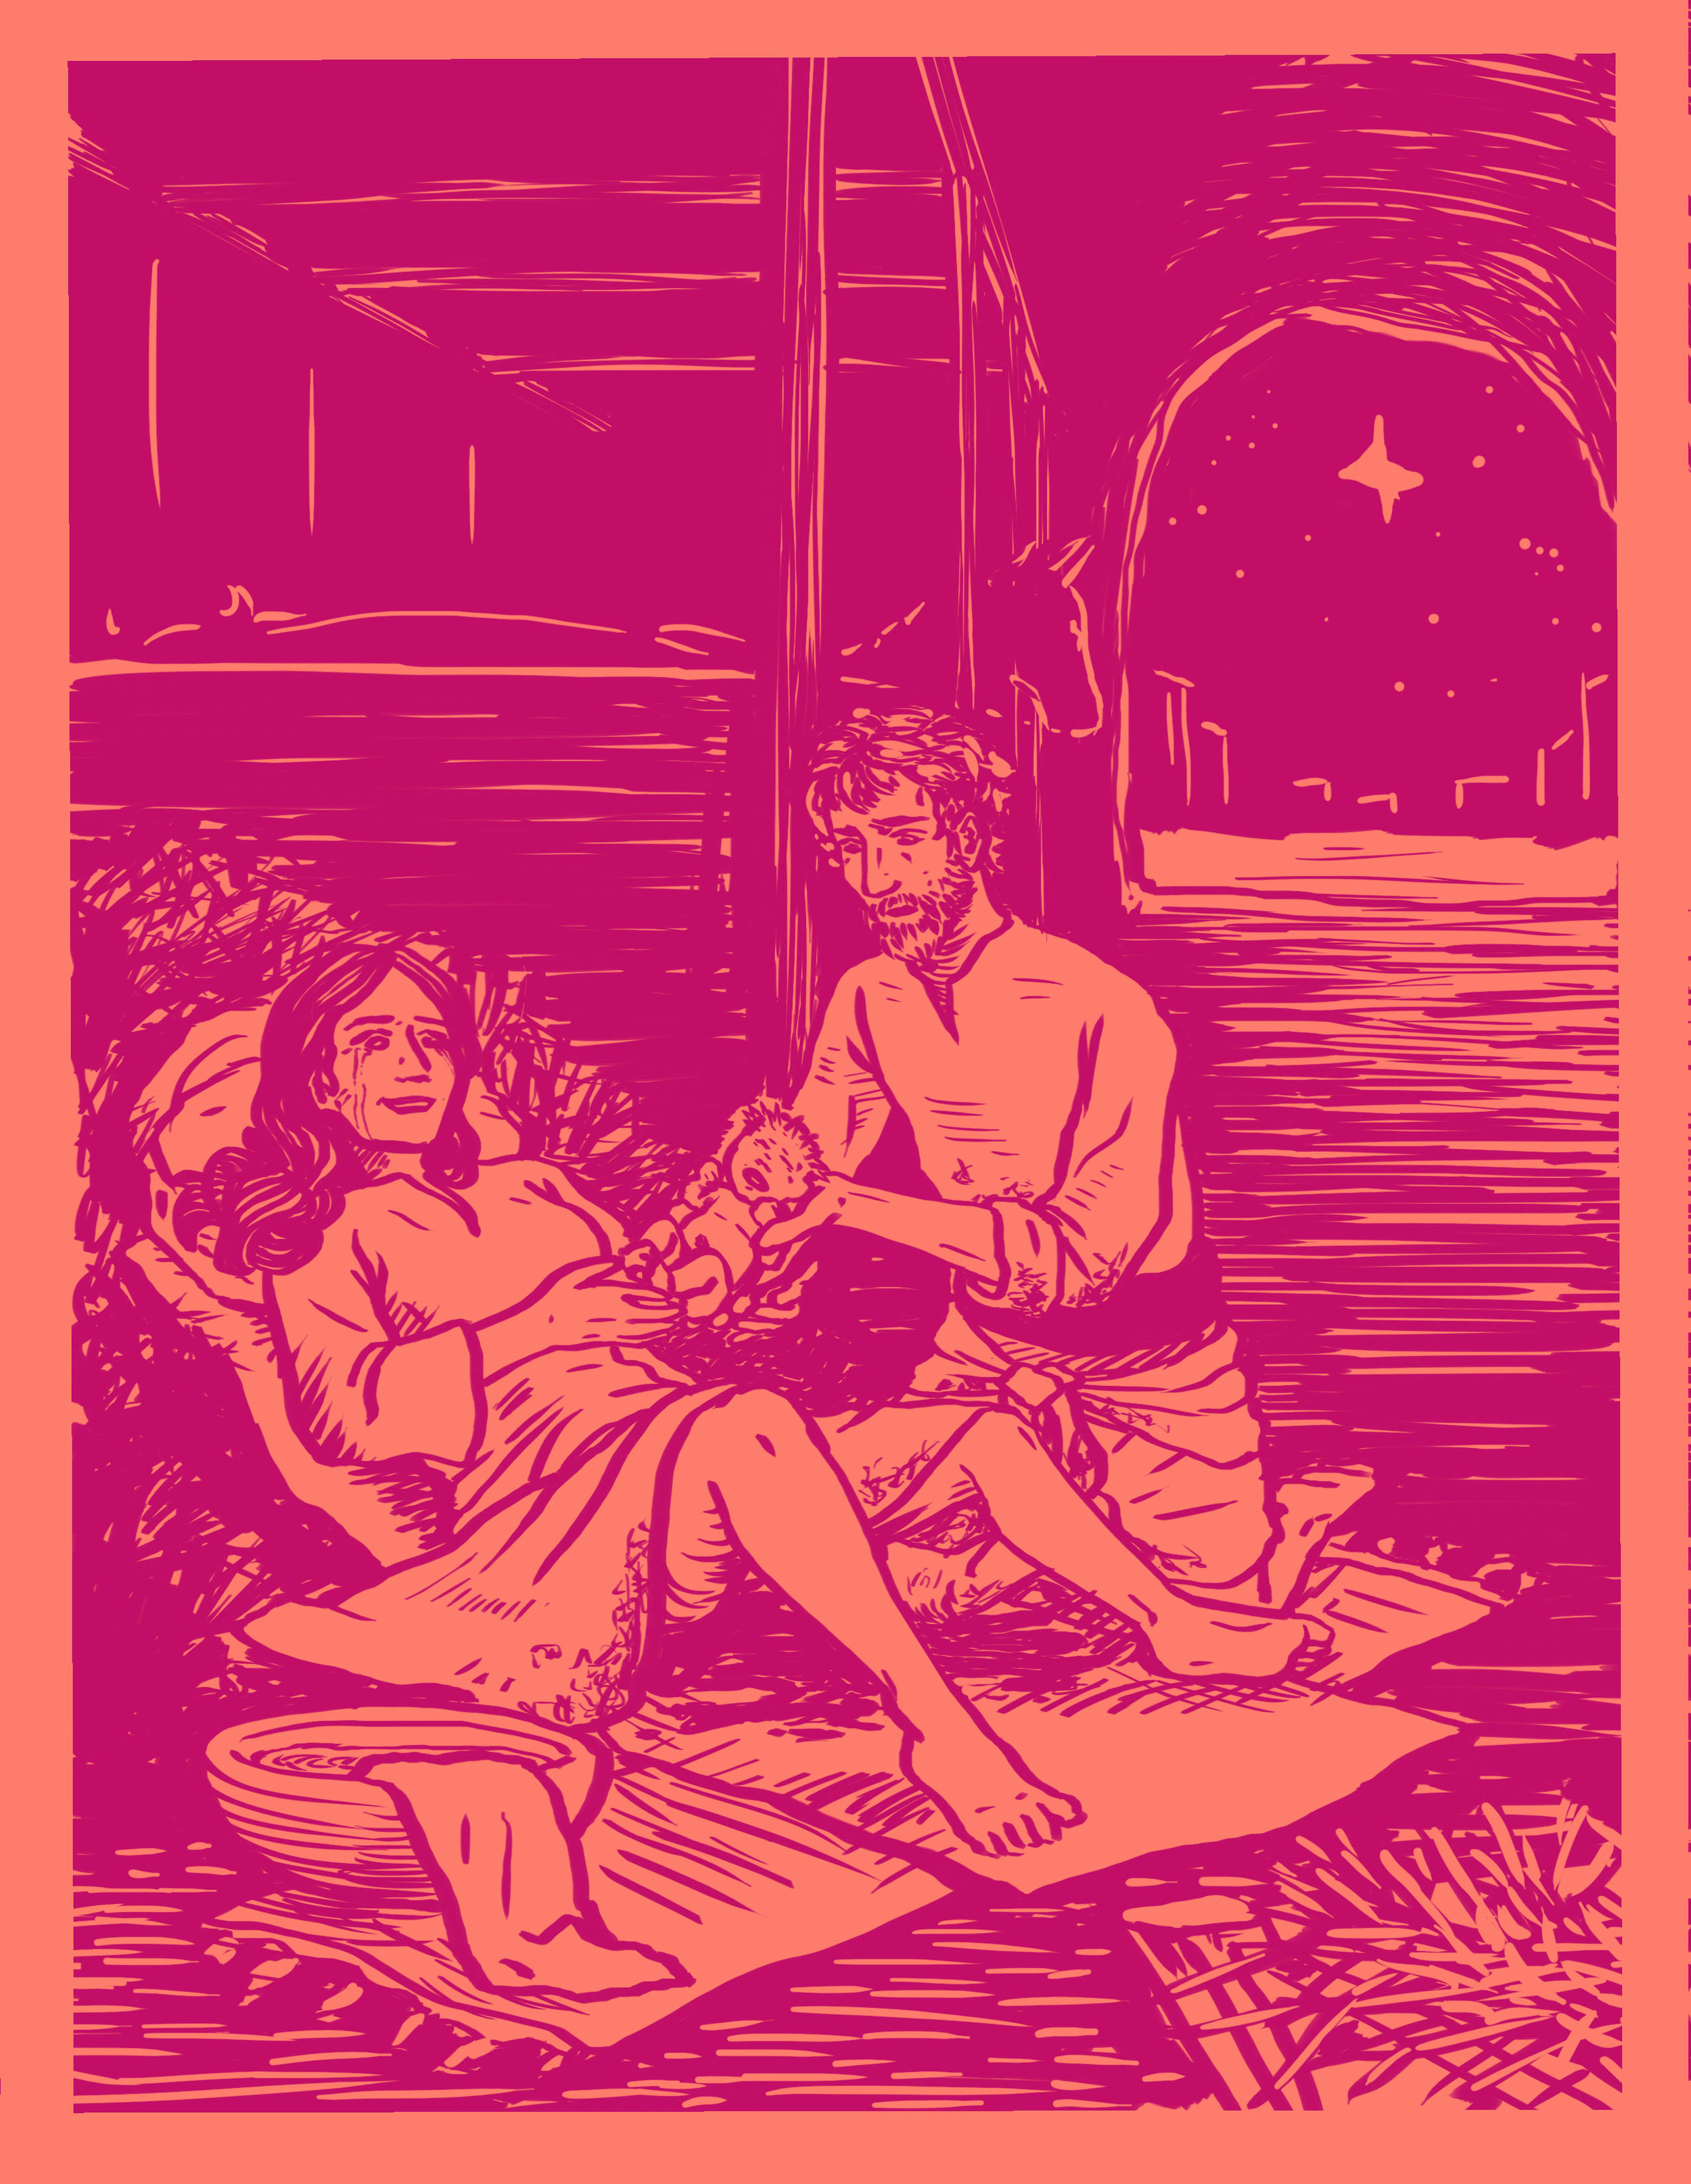 Lent Illustrations 2019Artboard 2.jpg